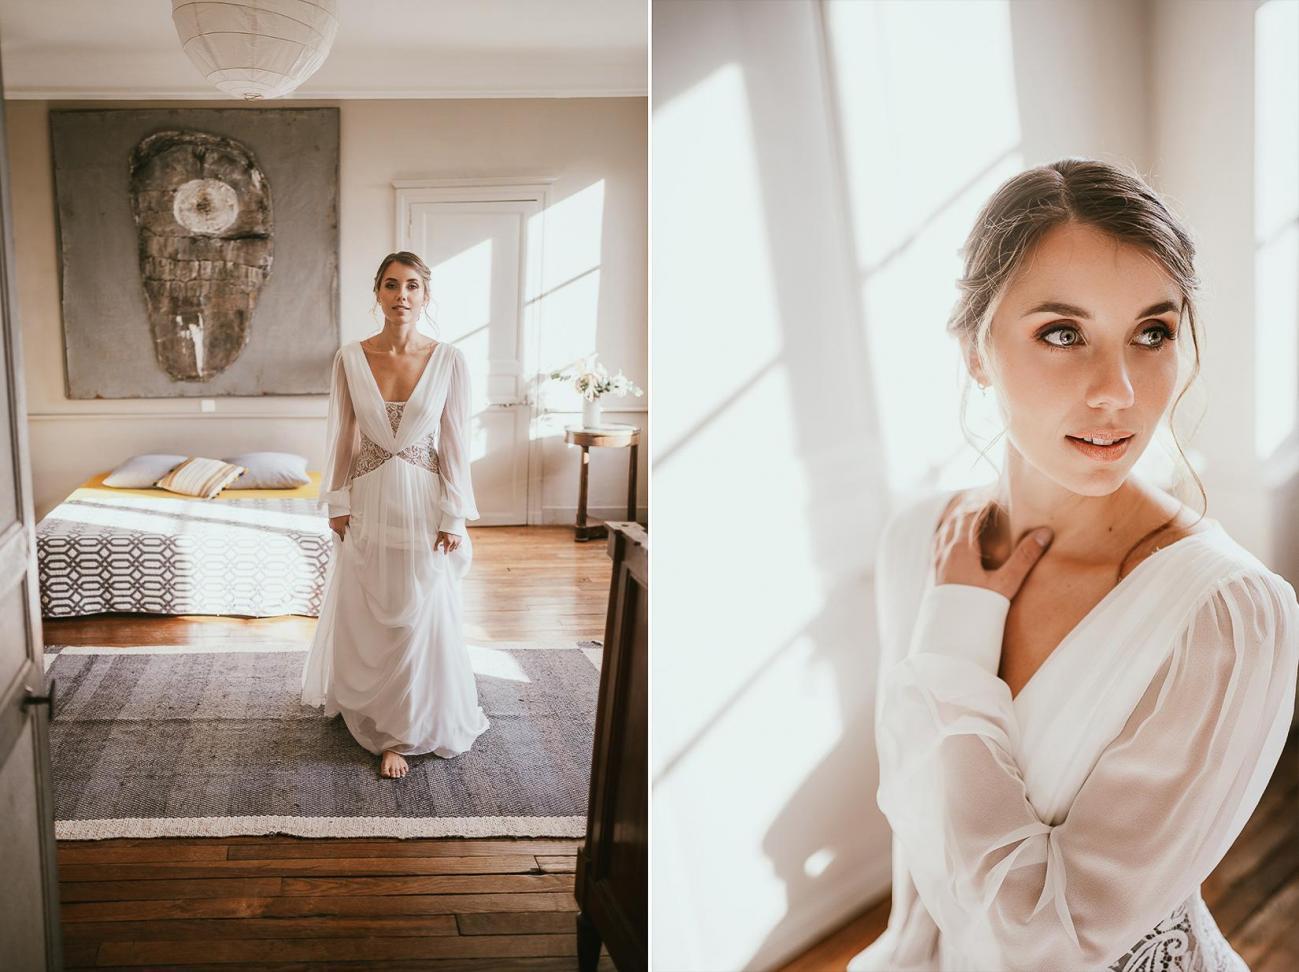 Mariage landes photographe inspiration elopement rustique wedding 74